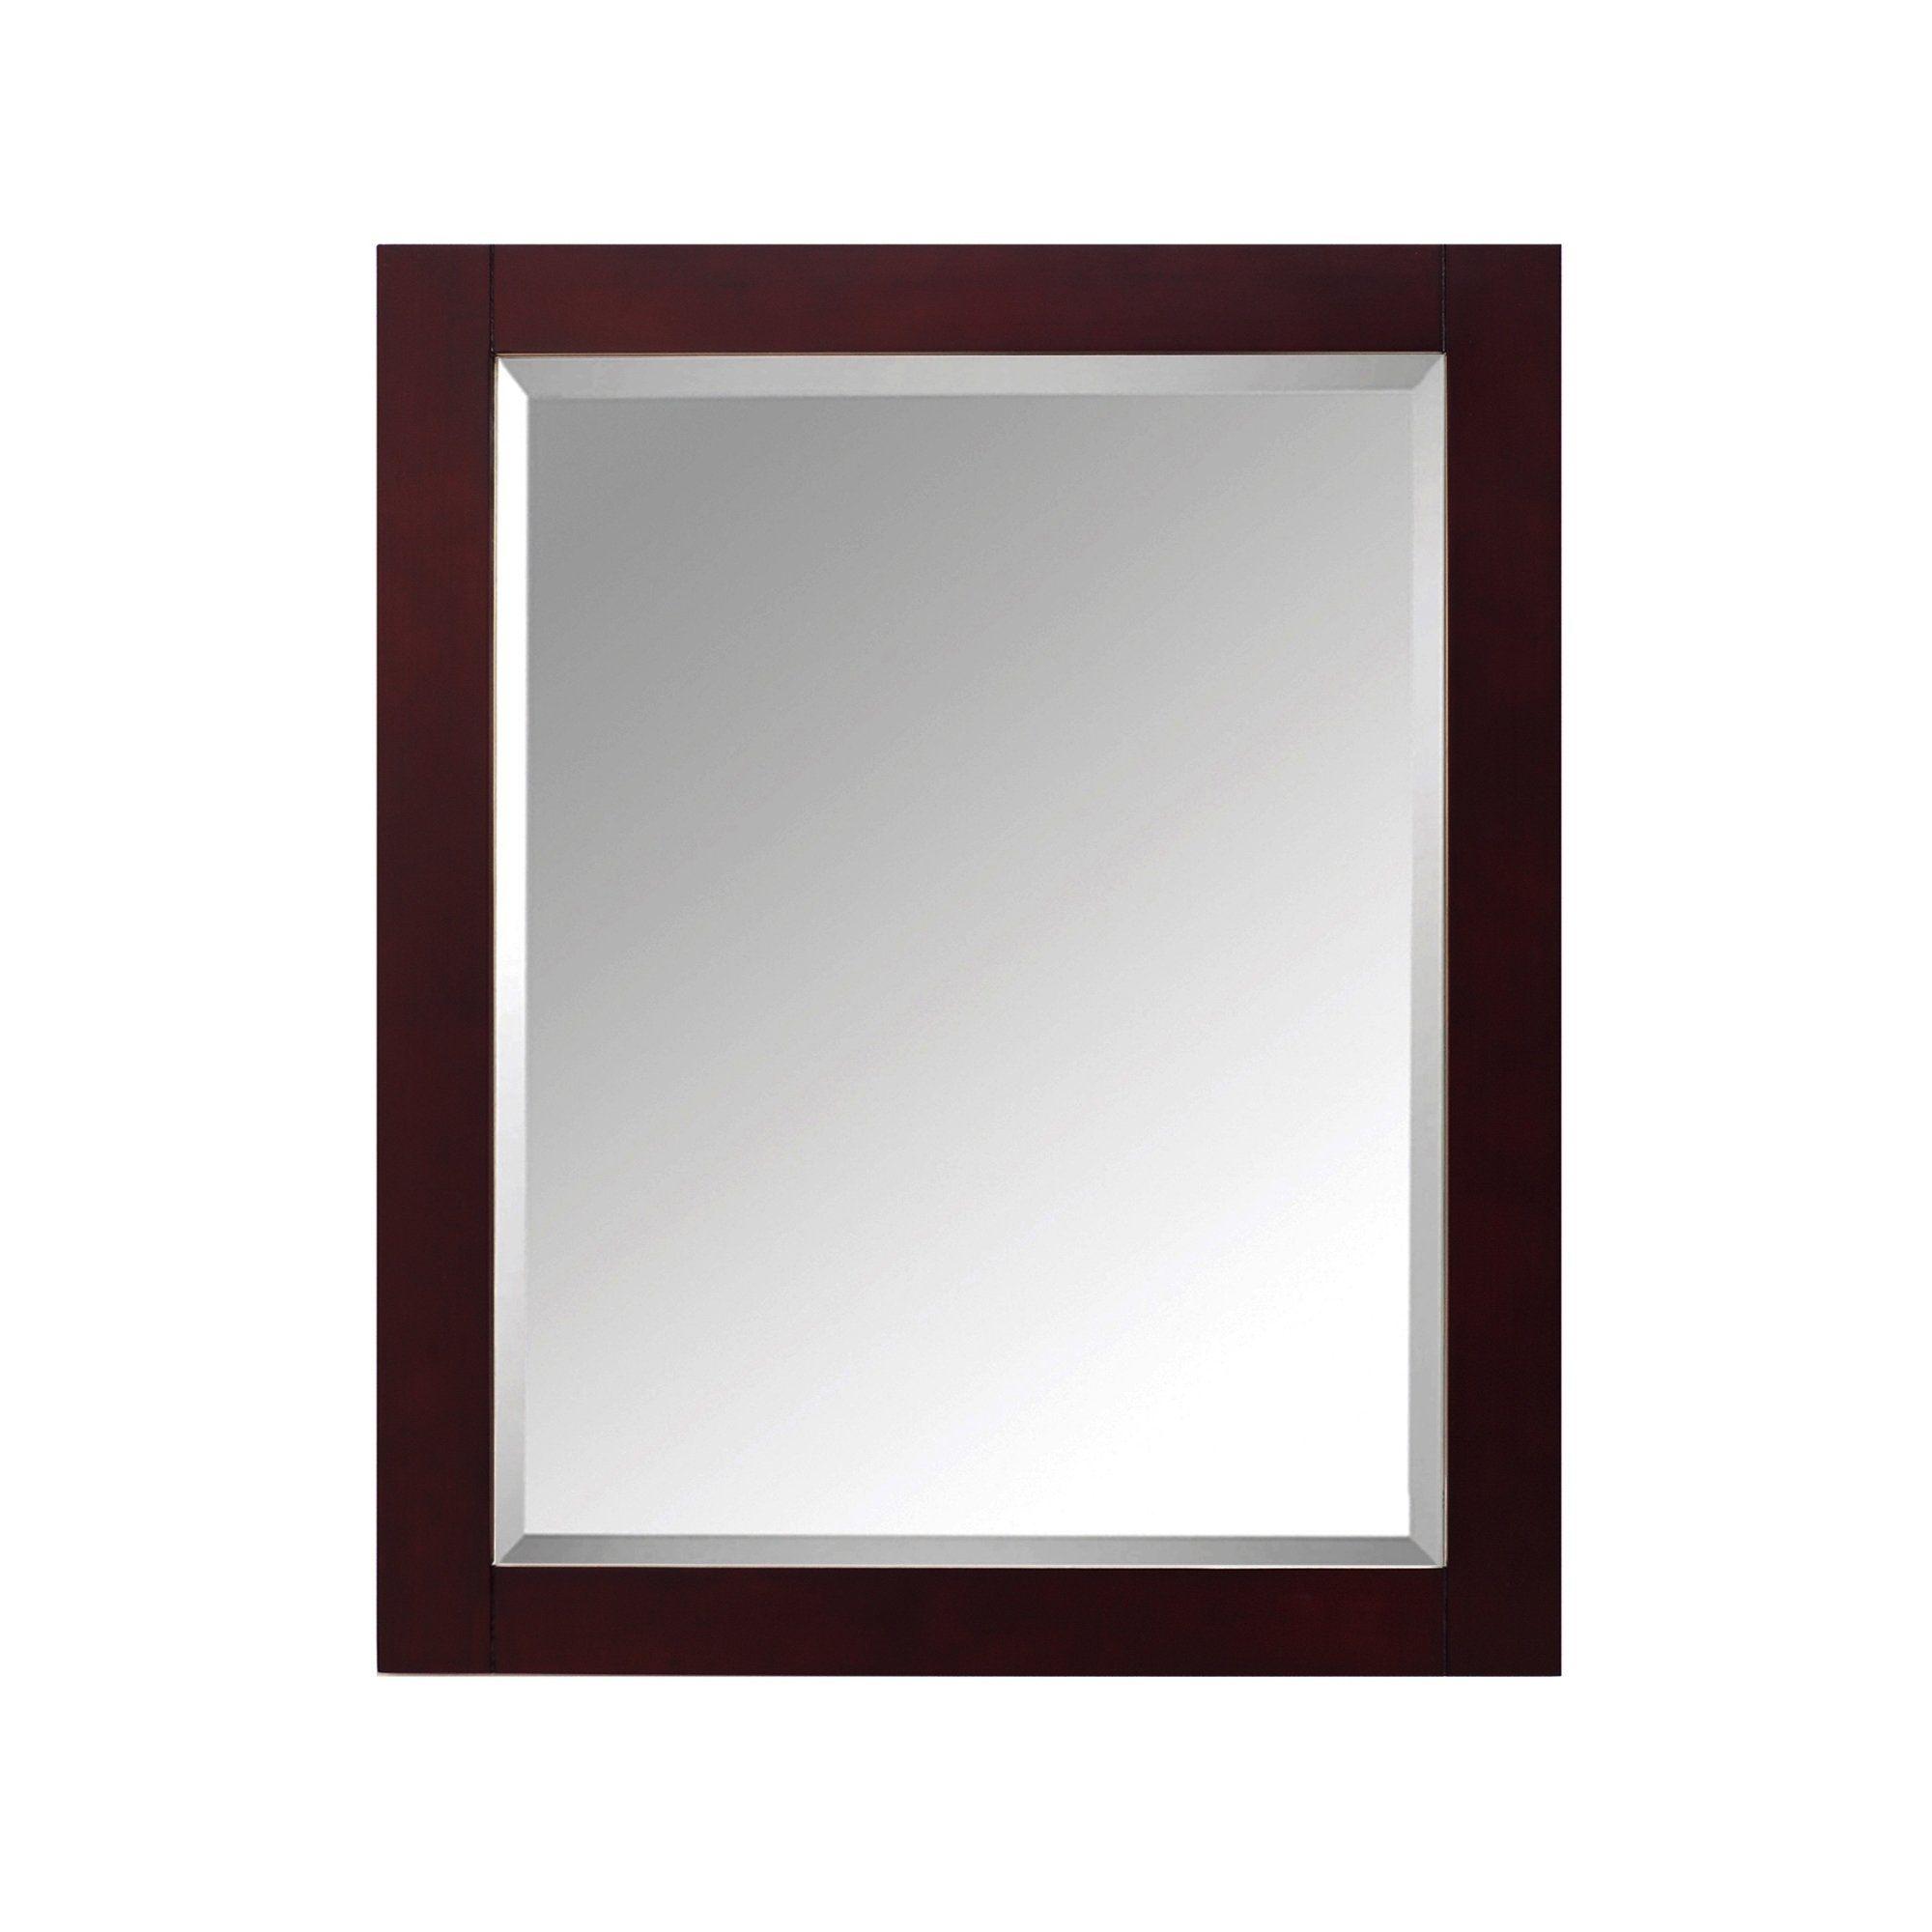 Avanity Modero 28 In Wall Mirror Espresso 28 W X 32 H